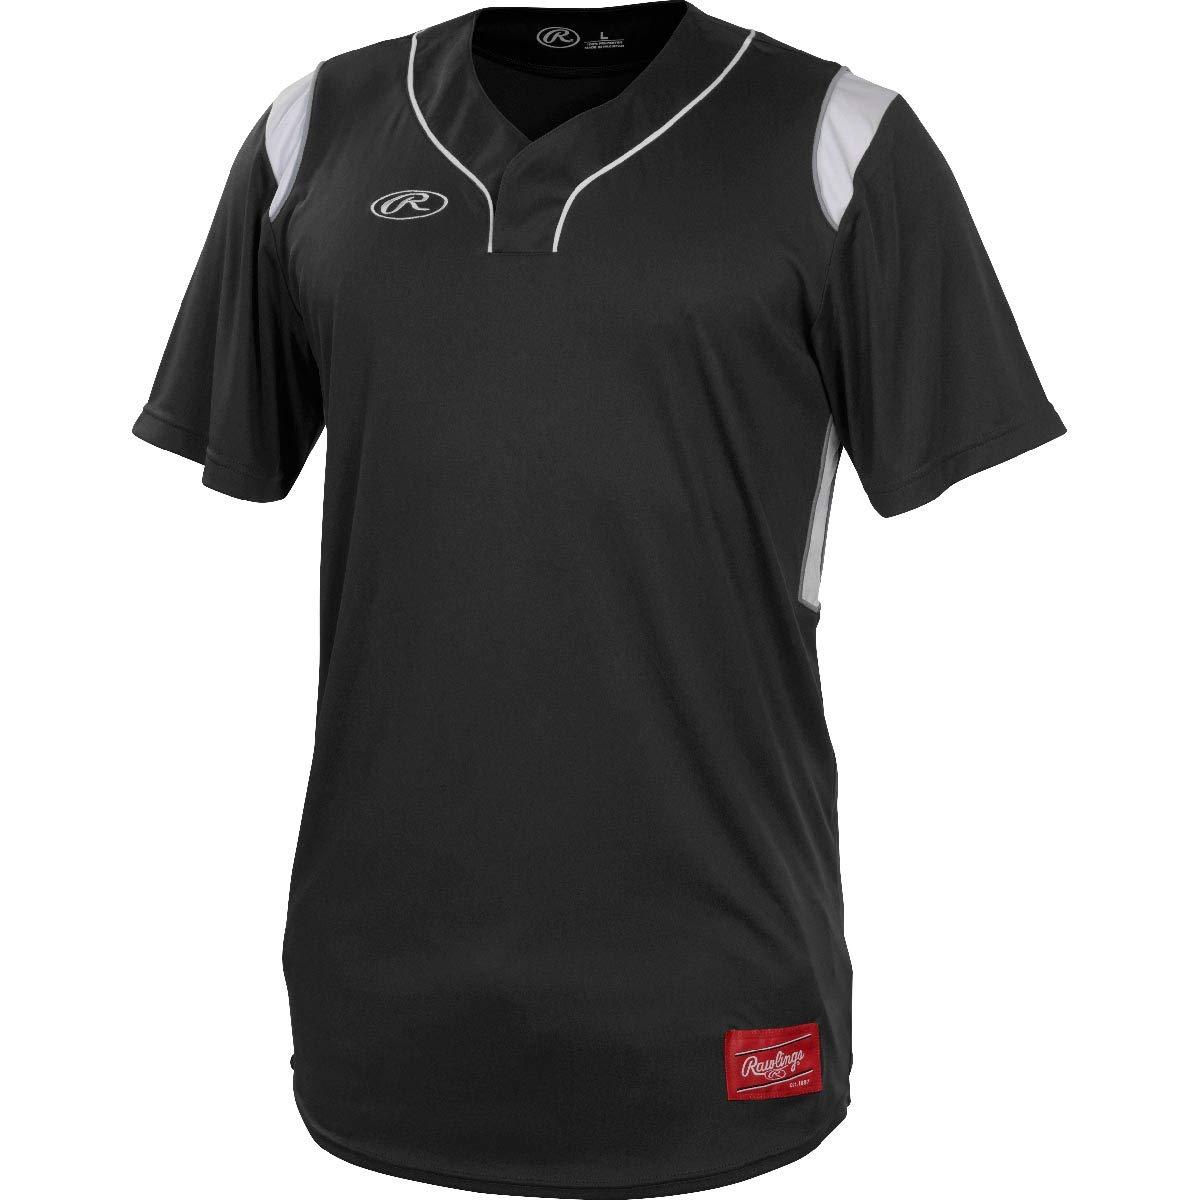 Rawlings Men's Game/Practice Hidden Button Baseball Jersey Series